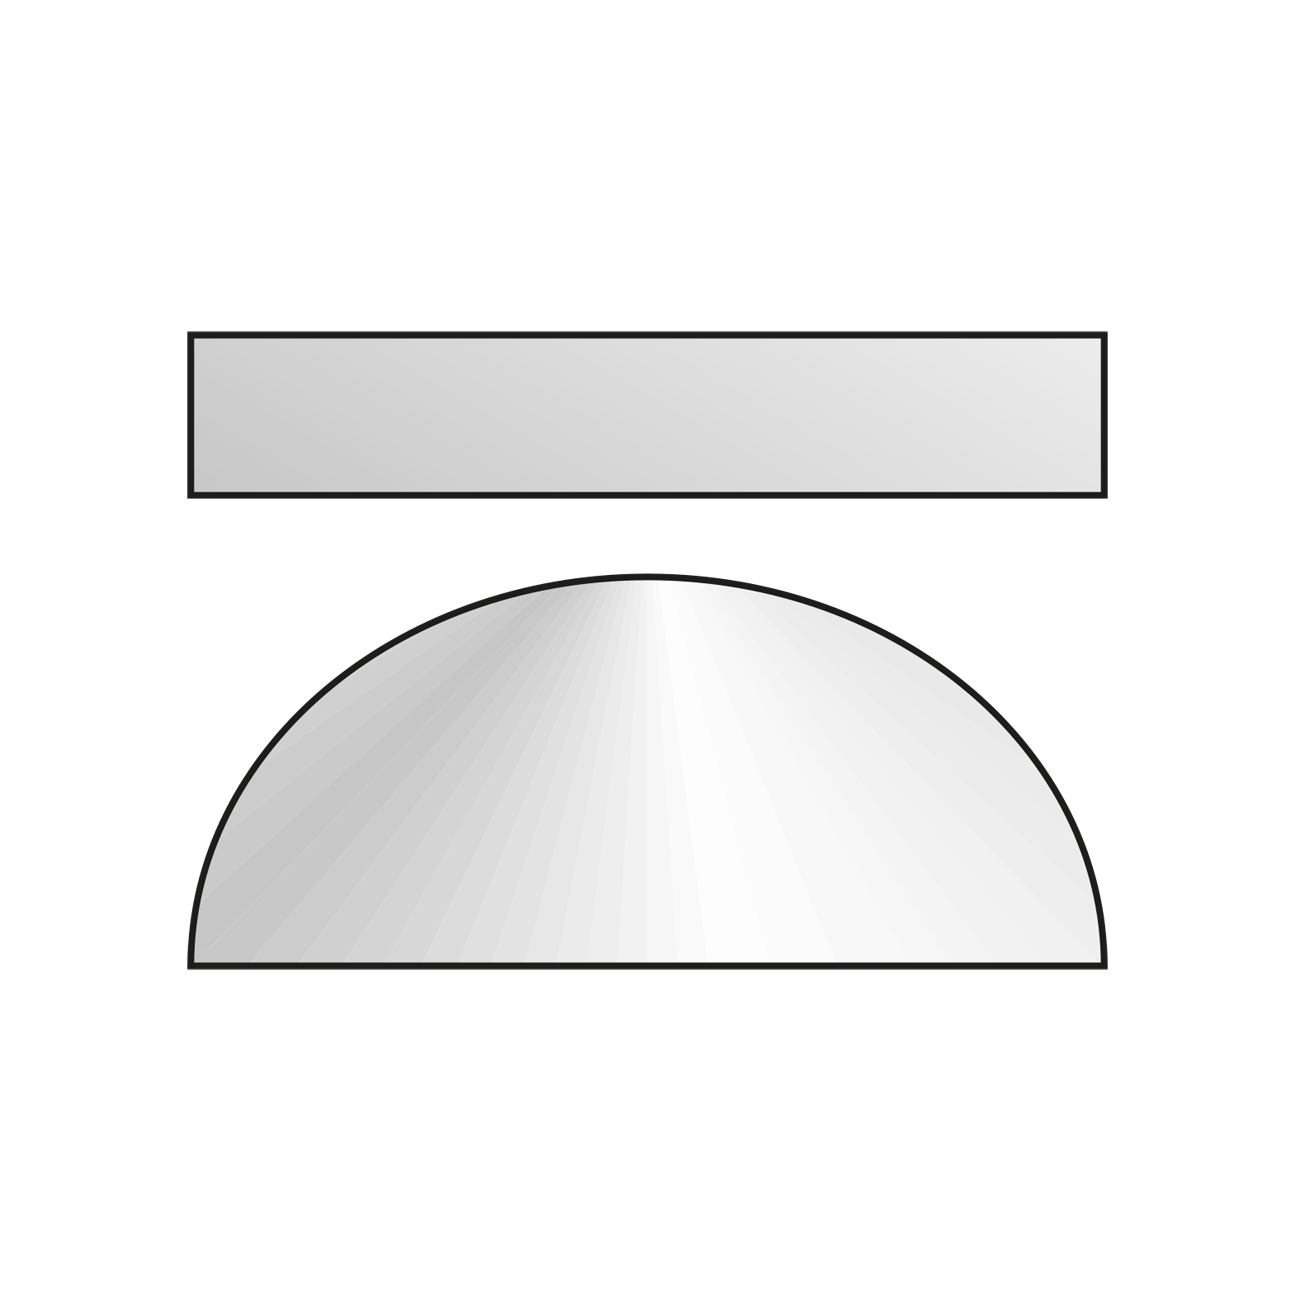 Pana Circulara 6888 Otel Olc45-3 X 5.0-13